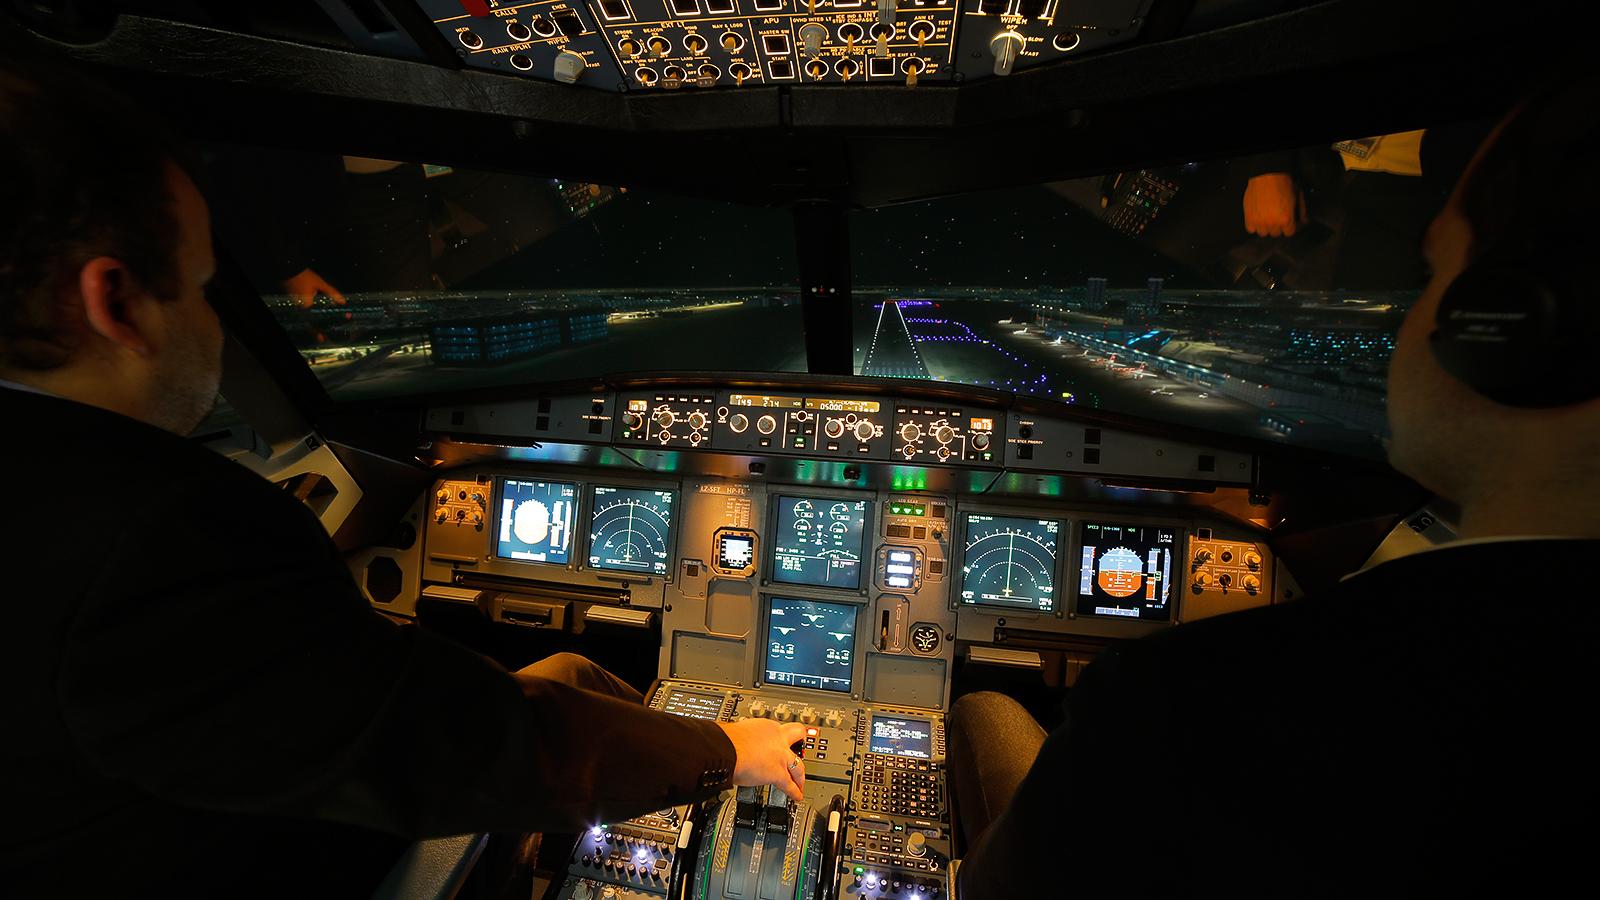 A320 Full Flight Simulator #2